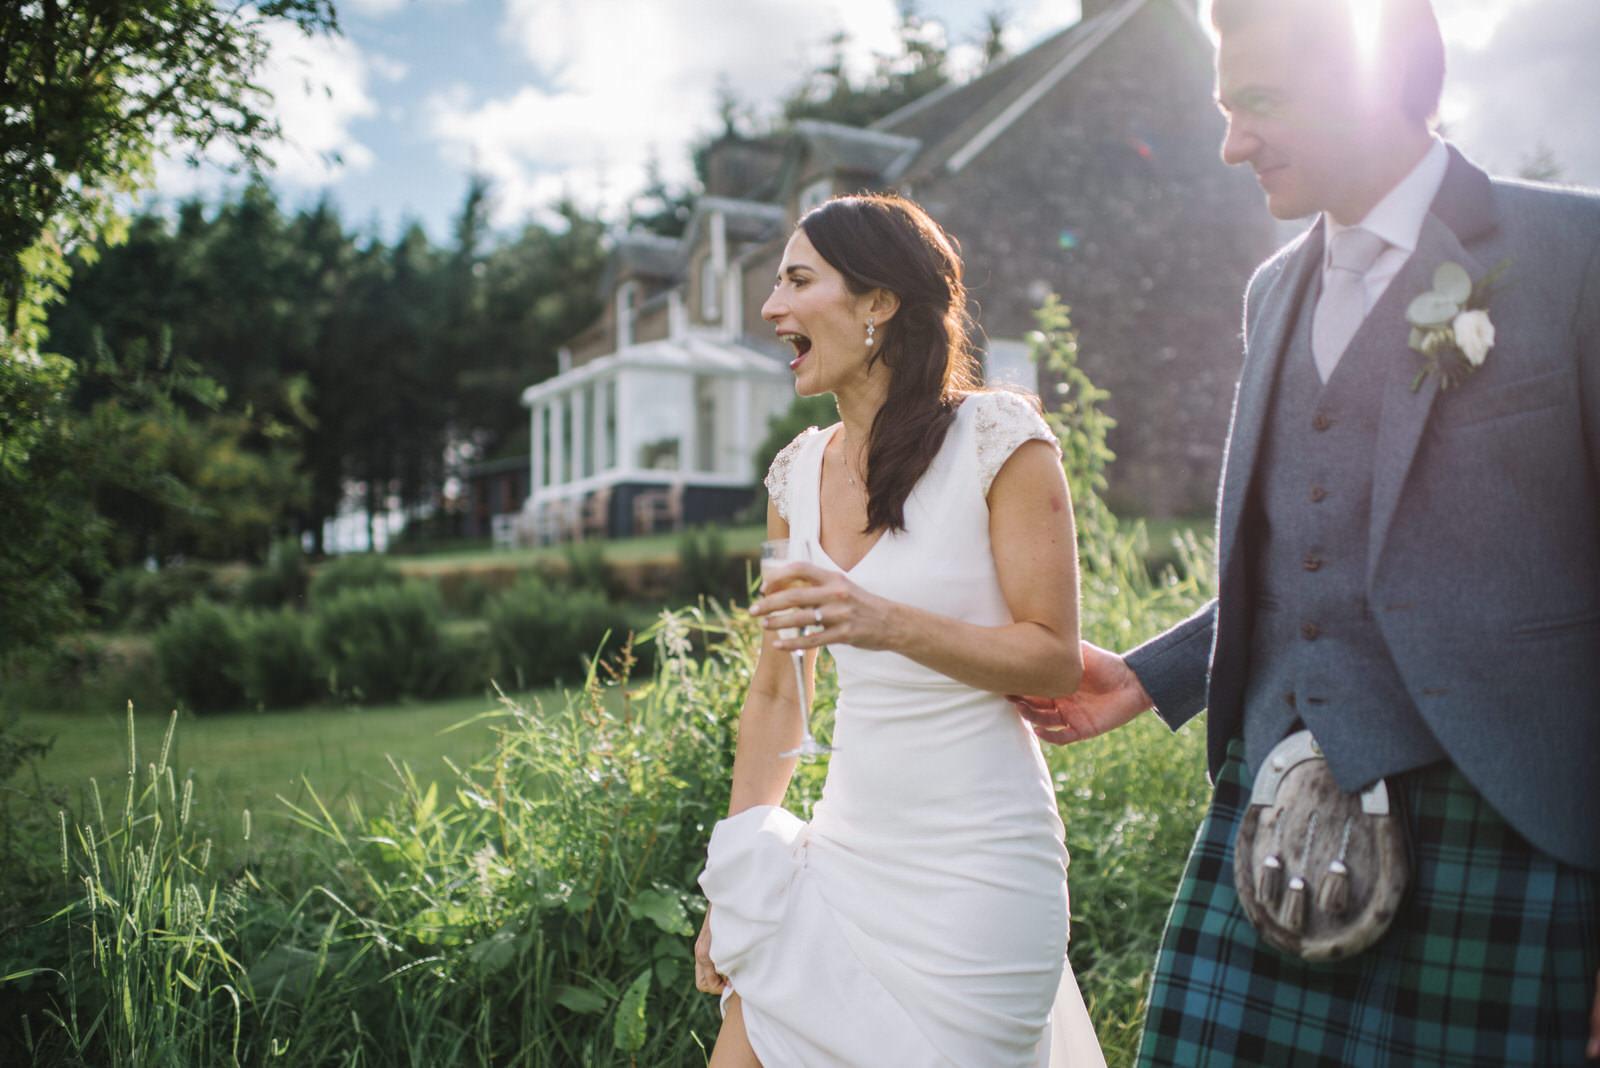 055-GUARDSWELL-FARM-WEDDING-ALTERNATIVE-SCOTTISH-WEDDING-PHOTOGRAPHER-SCOTTISH-WEDDING-DESTINATION-WEDDING-PHOTOGRAPHER.JPG